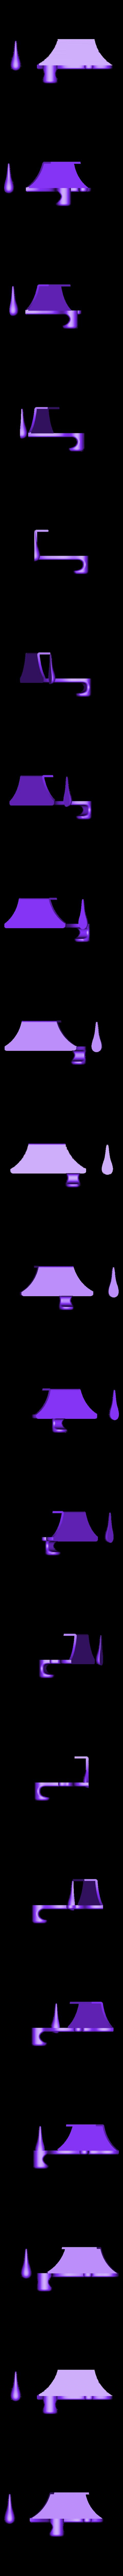 Drip_hanger_25mm.stl Download free STL file Drip Hook • 3D printing template, Pongo